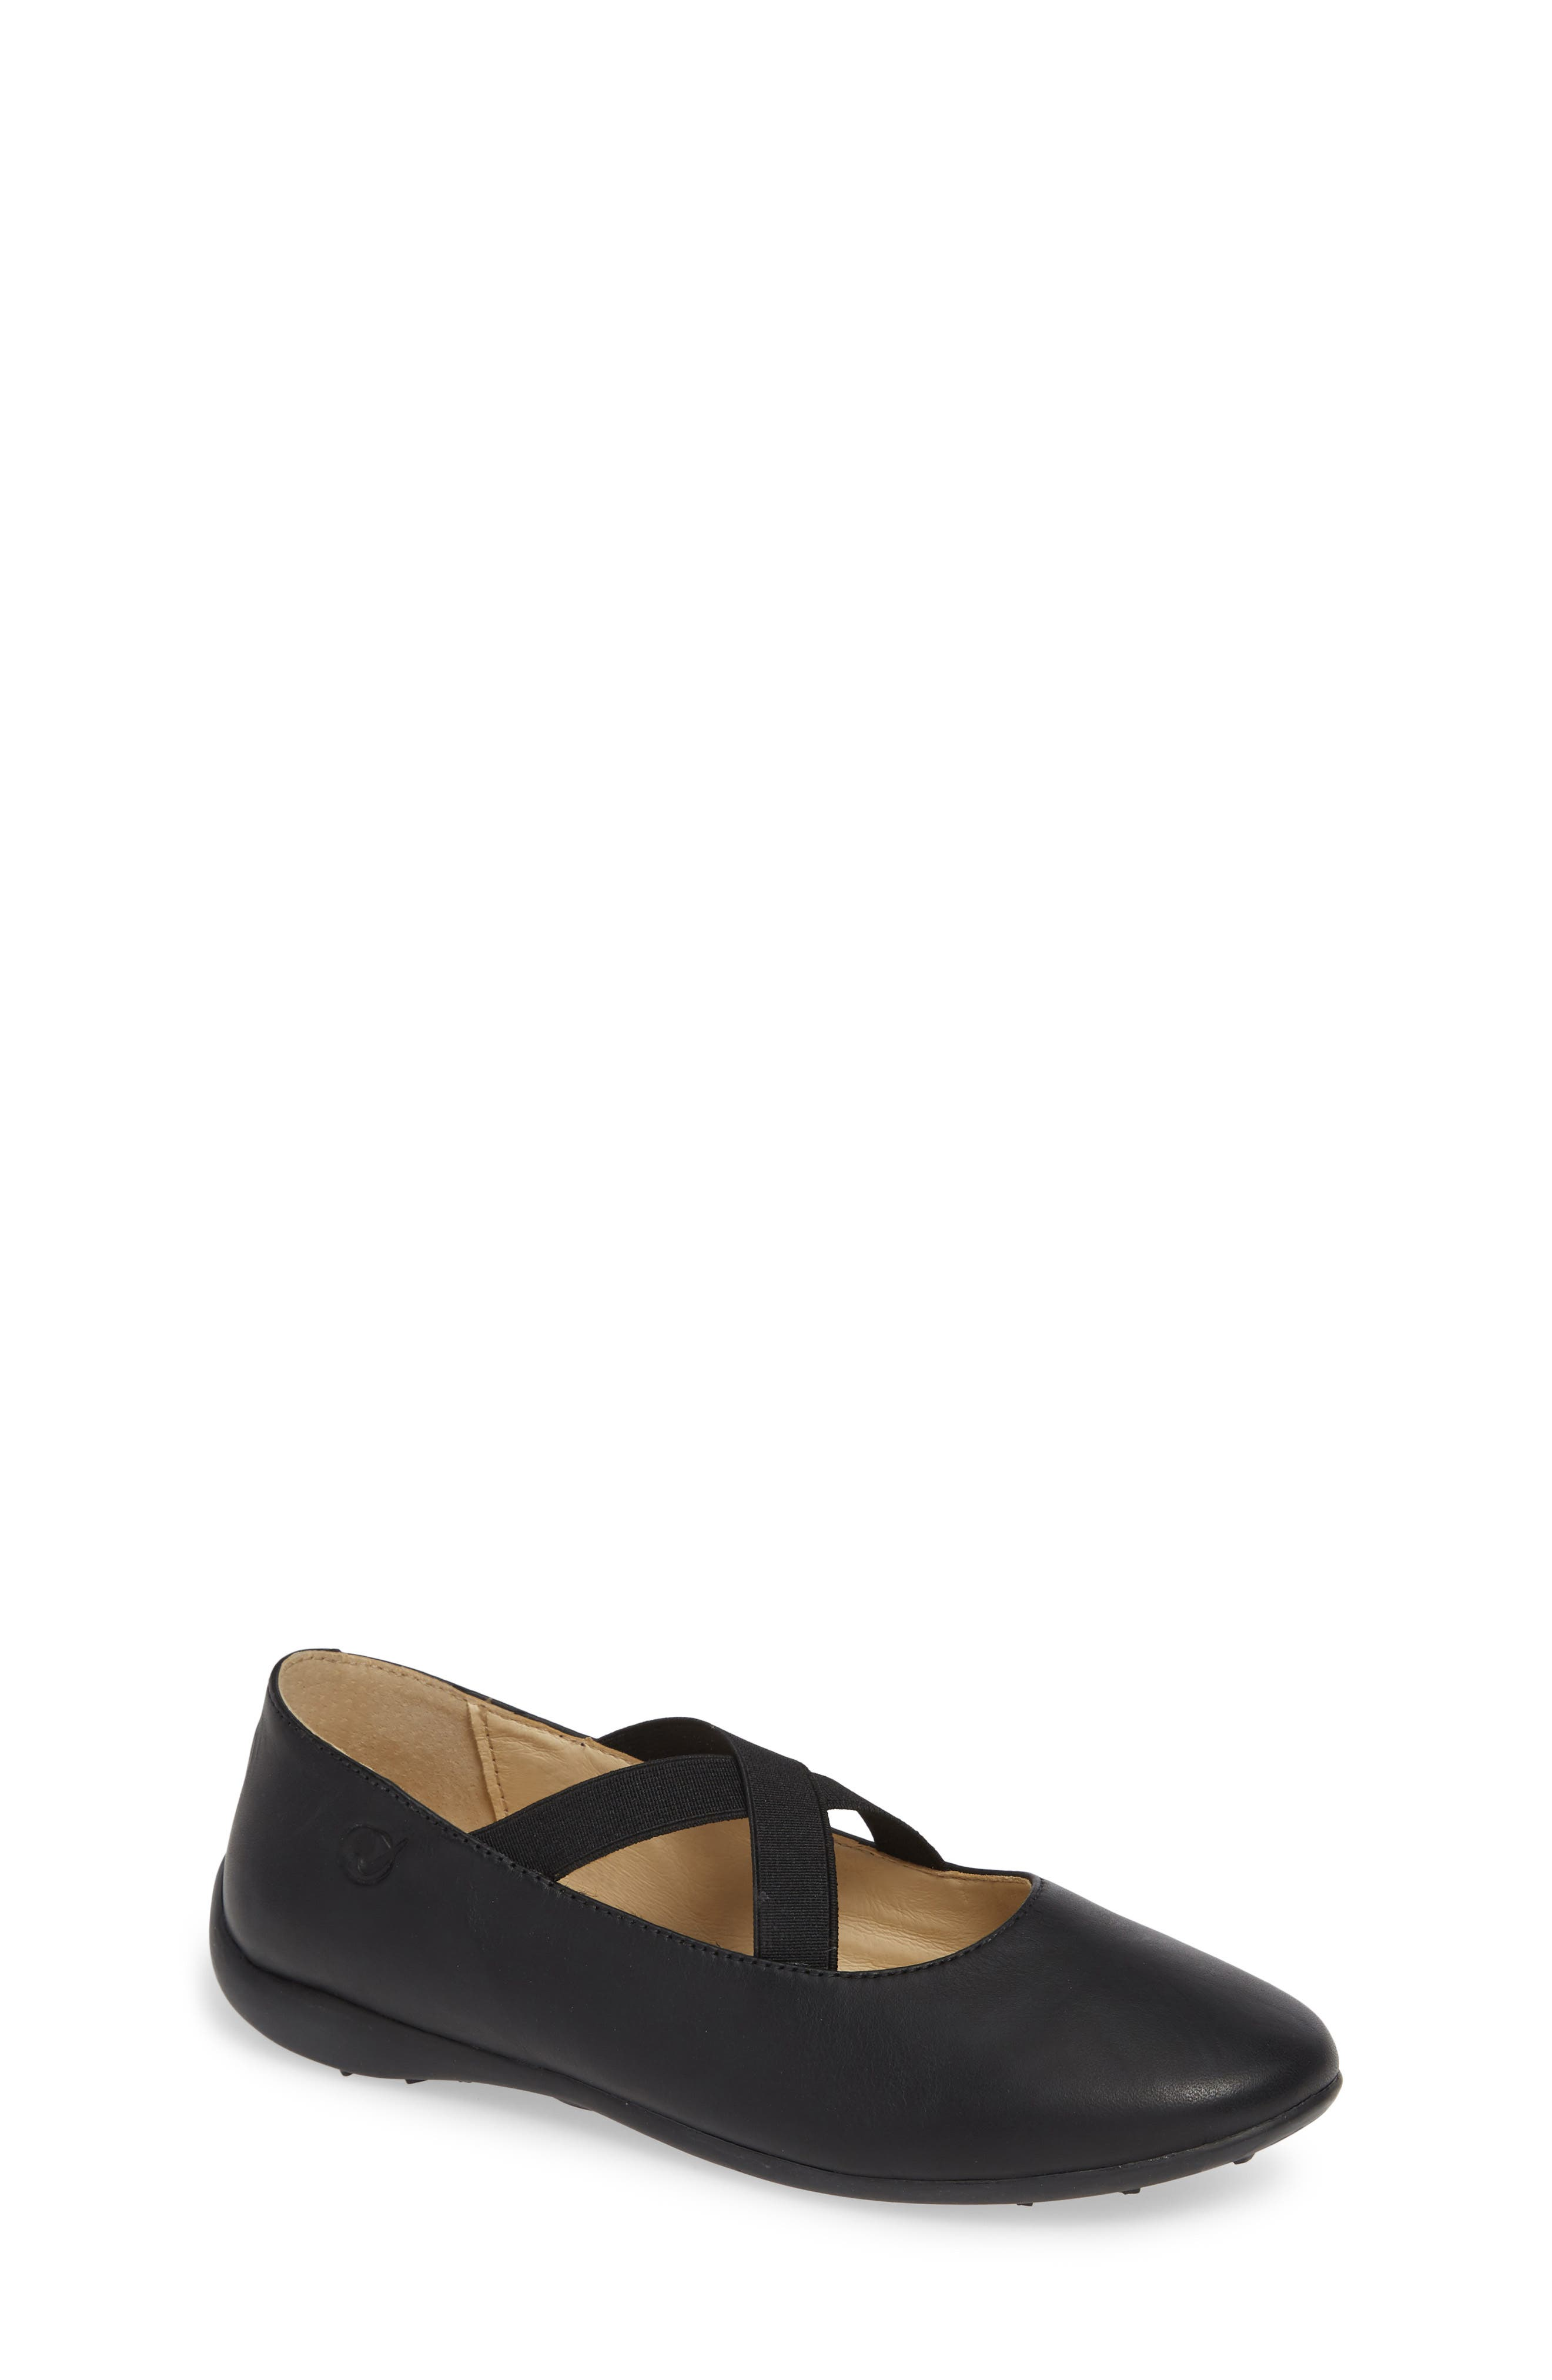 Matera Ballet Flat,                         Main,                         color, Black Leather